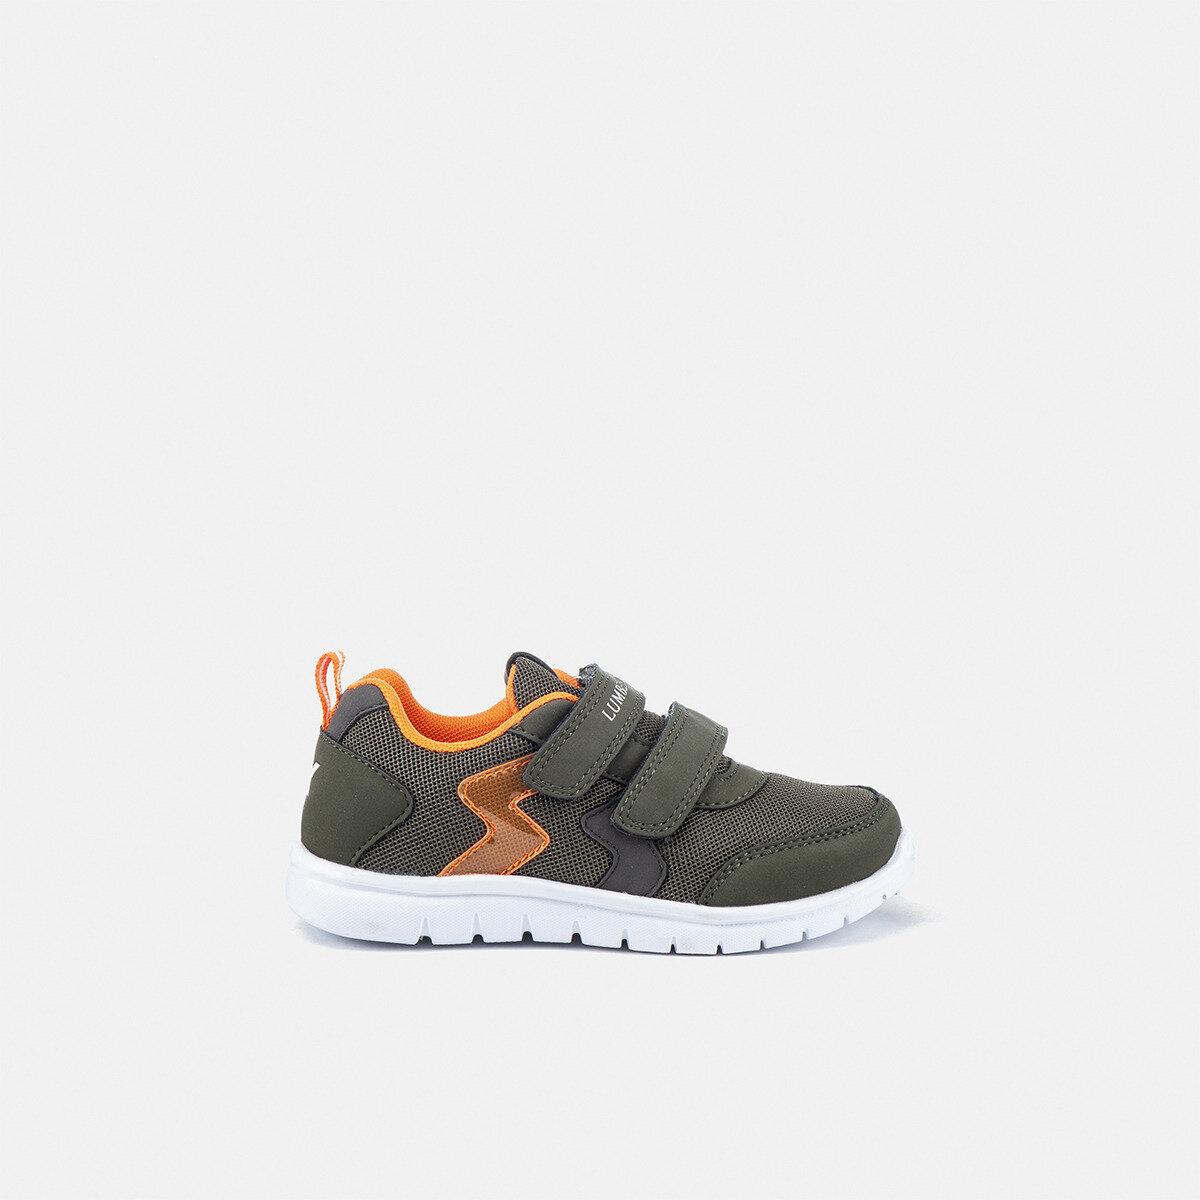 CRASH MILITARY GREEN/ORANGE Boy Sneakers